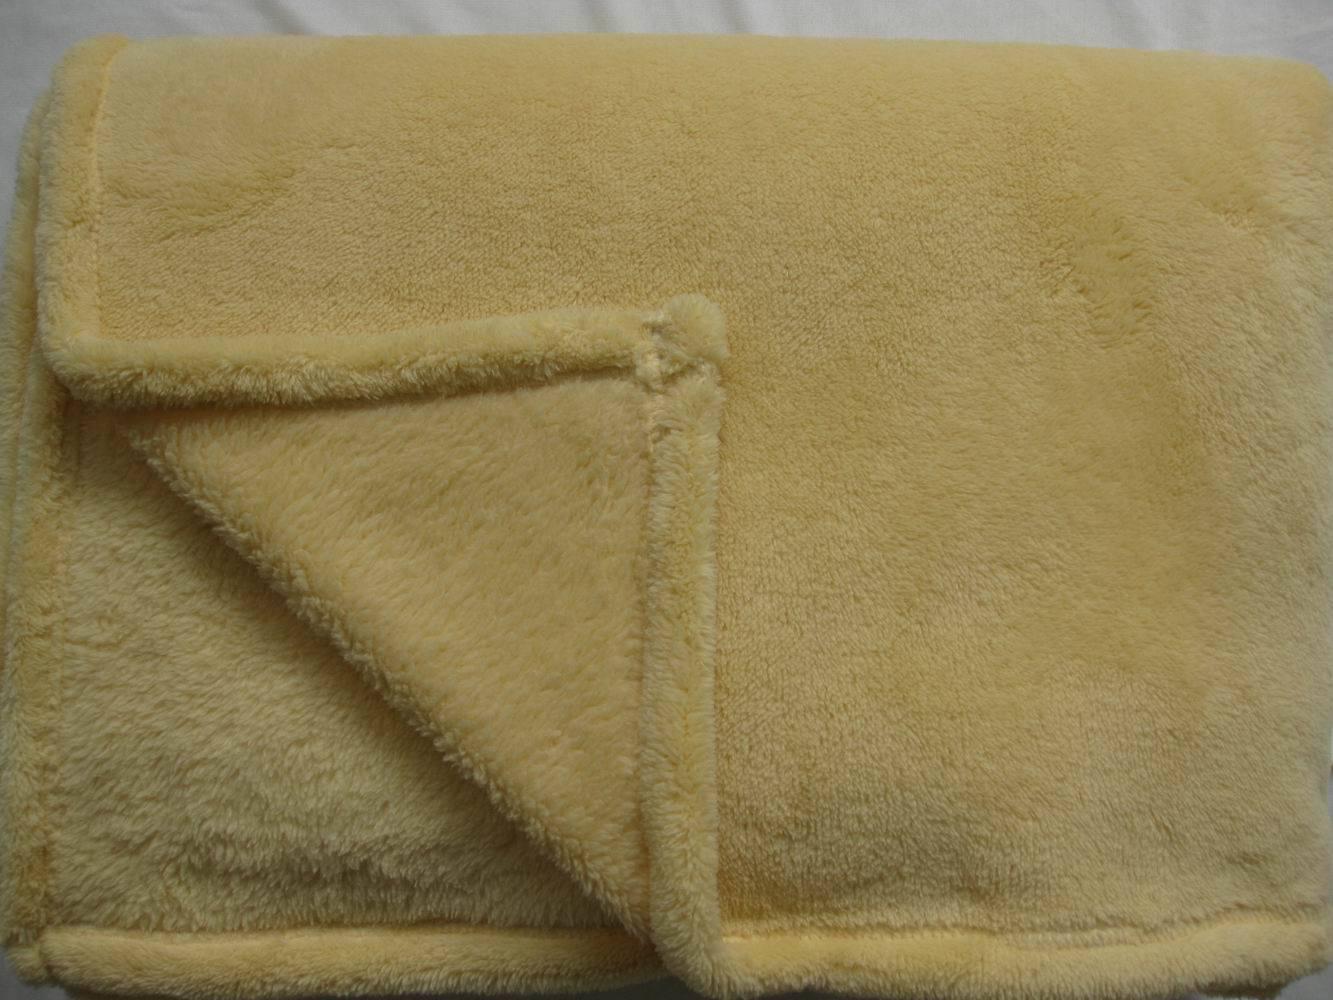 China Soft Fleece Blanket China Soft Fleece Blanket